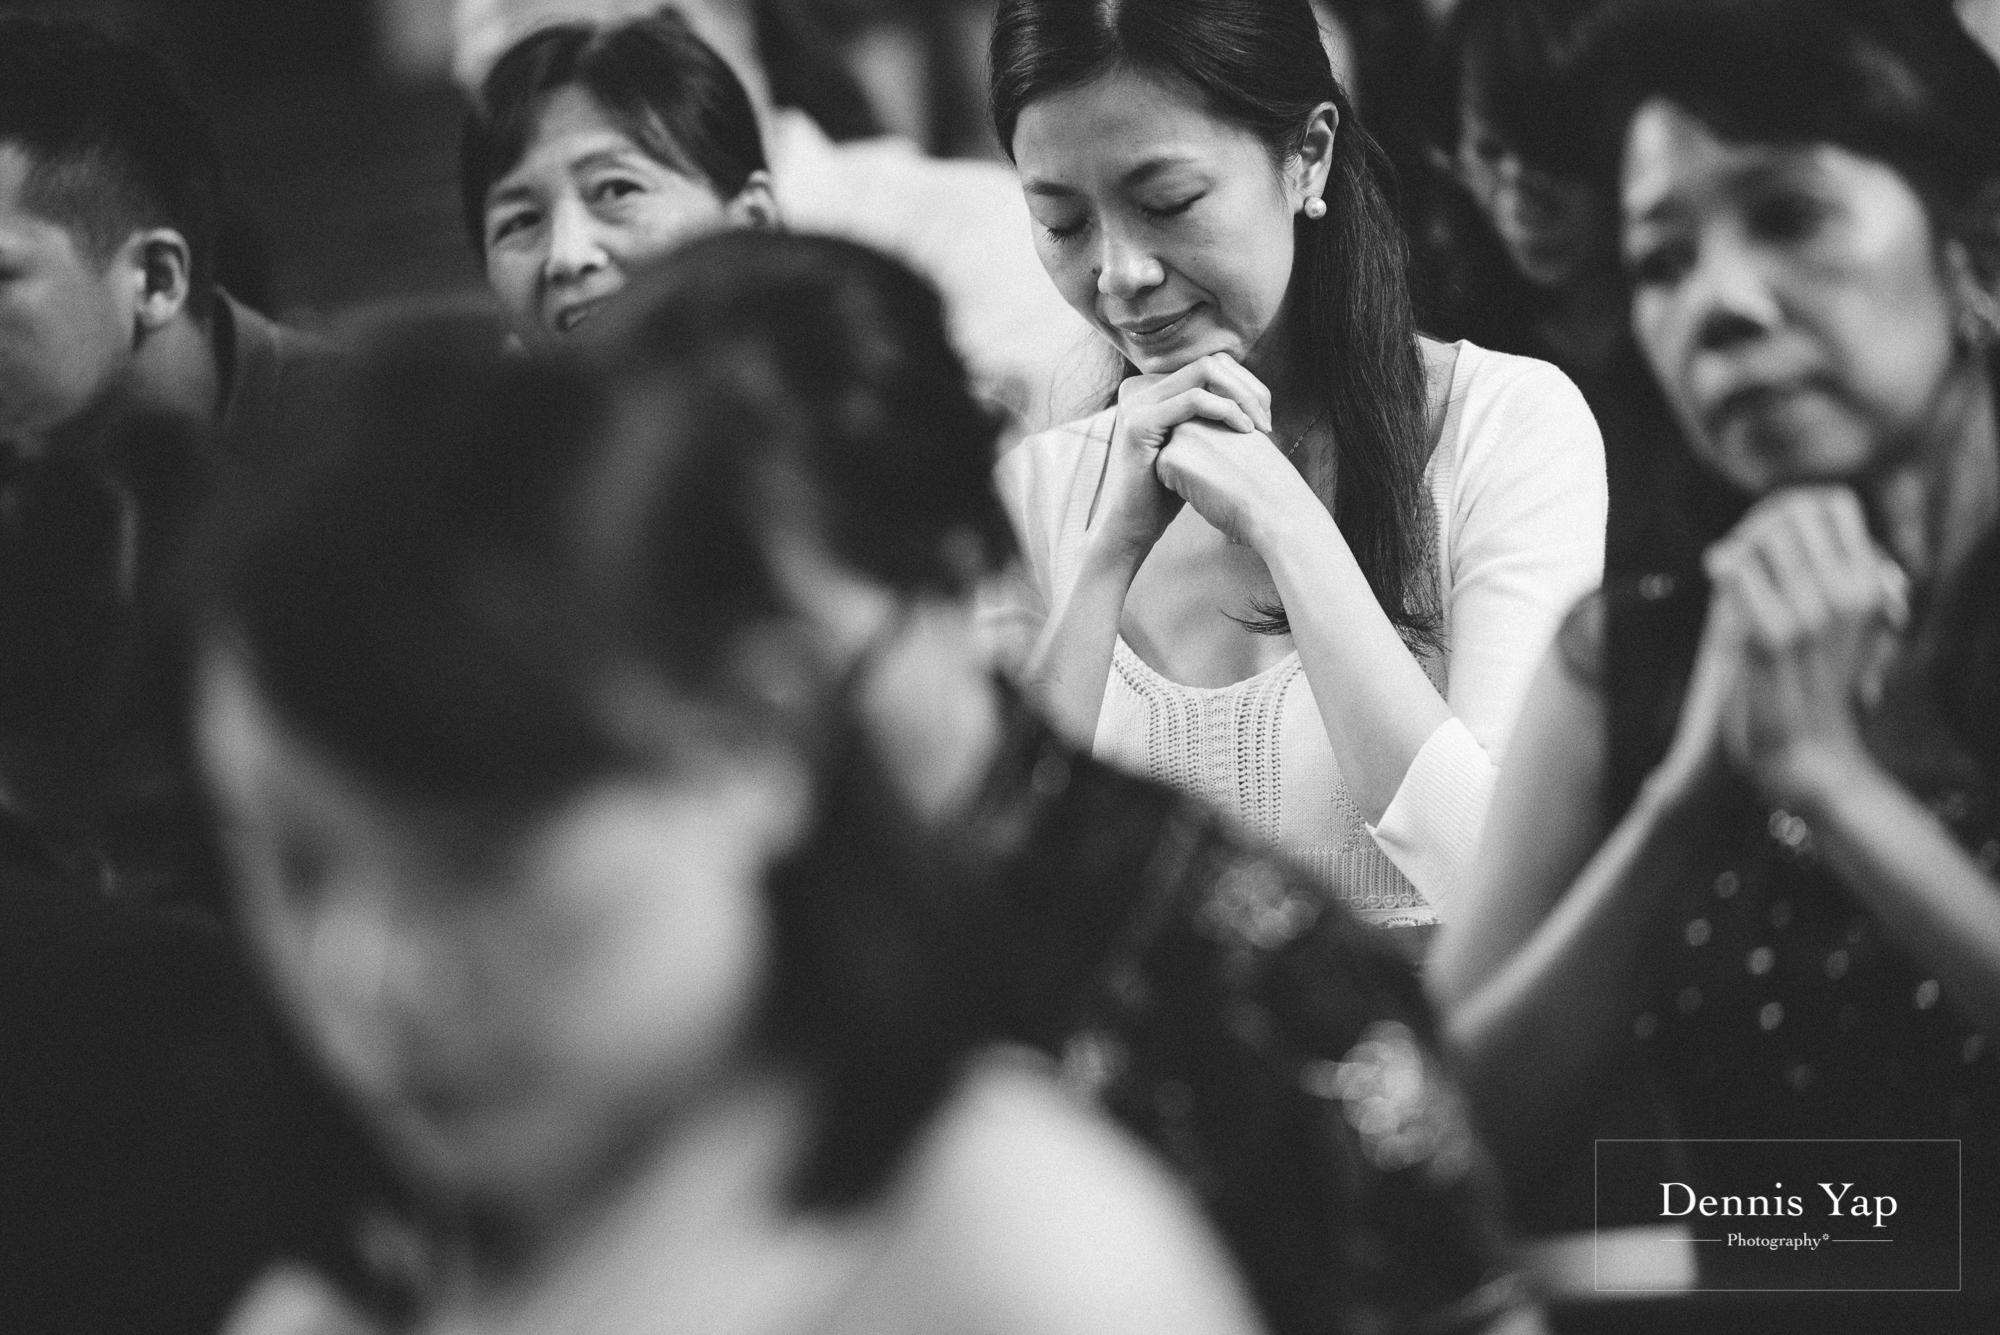 ino sheri black white church wedding st thomas more subang jaya dennis yap photography touching love beloved australia indonesia-32.jpg